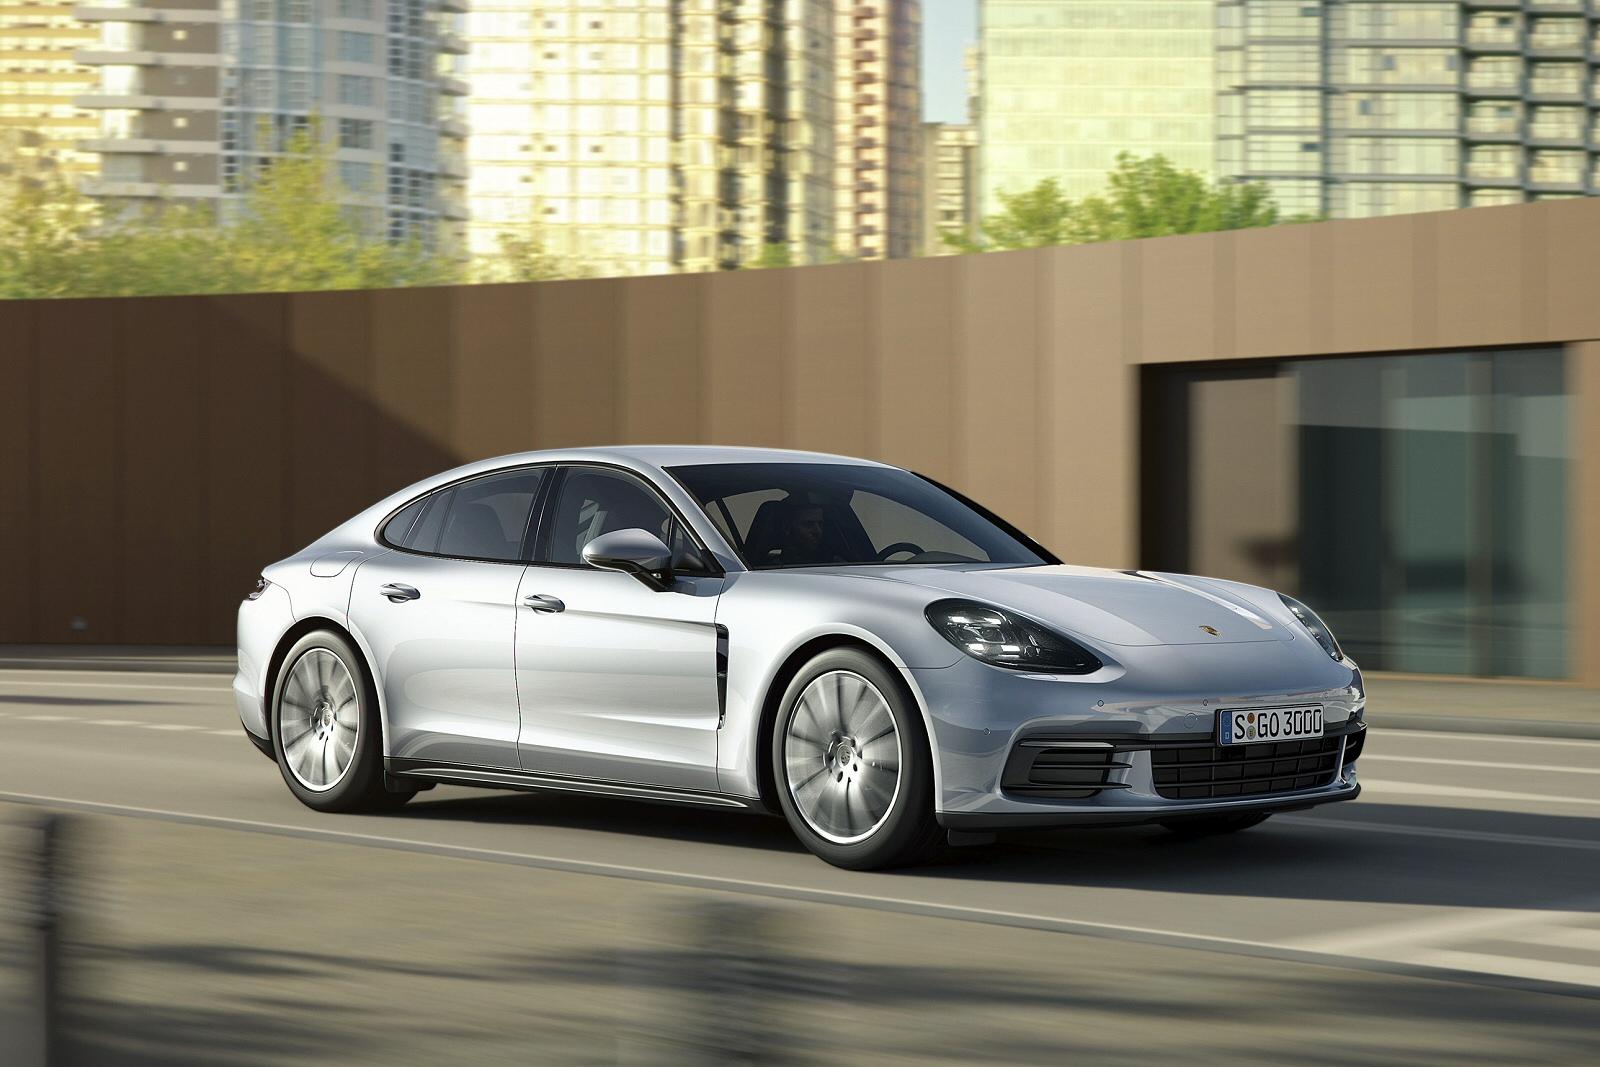 Silver Porsche Panamera driving